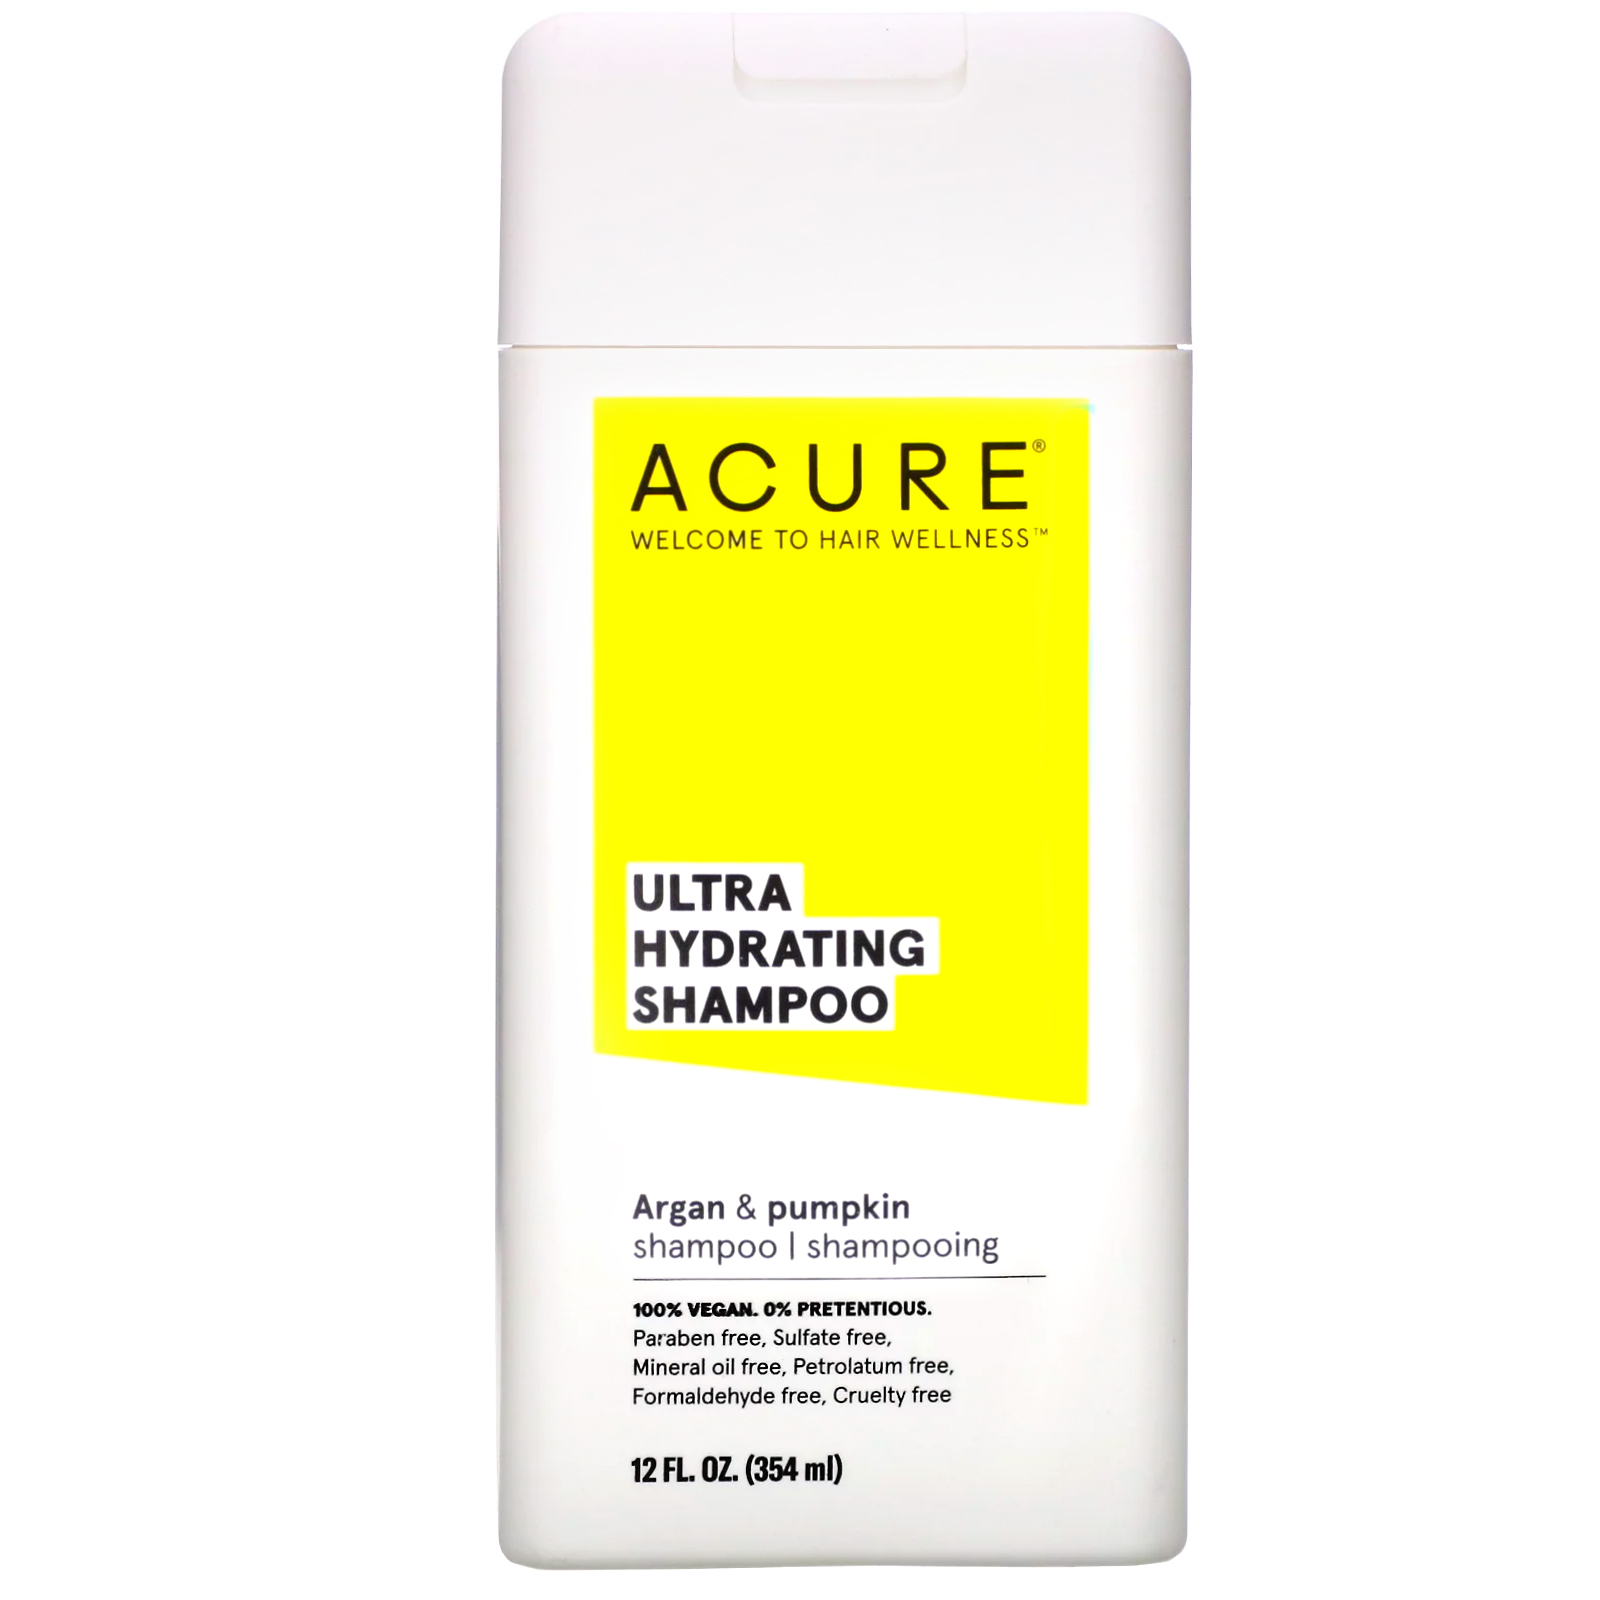 Acure, Ultra Hydrating Shampoo, Argan Oil & Pumpkin, 12 Fl